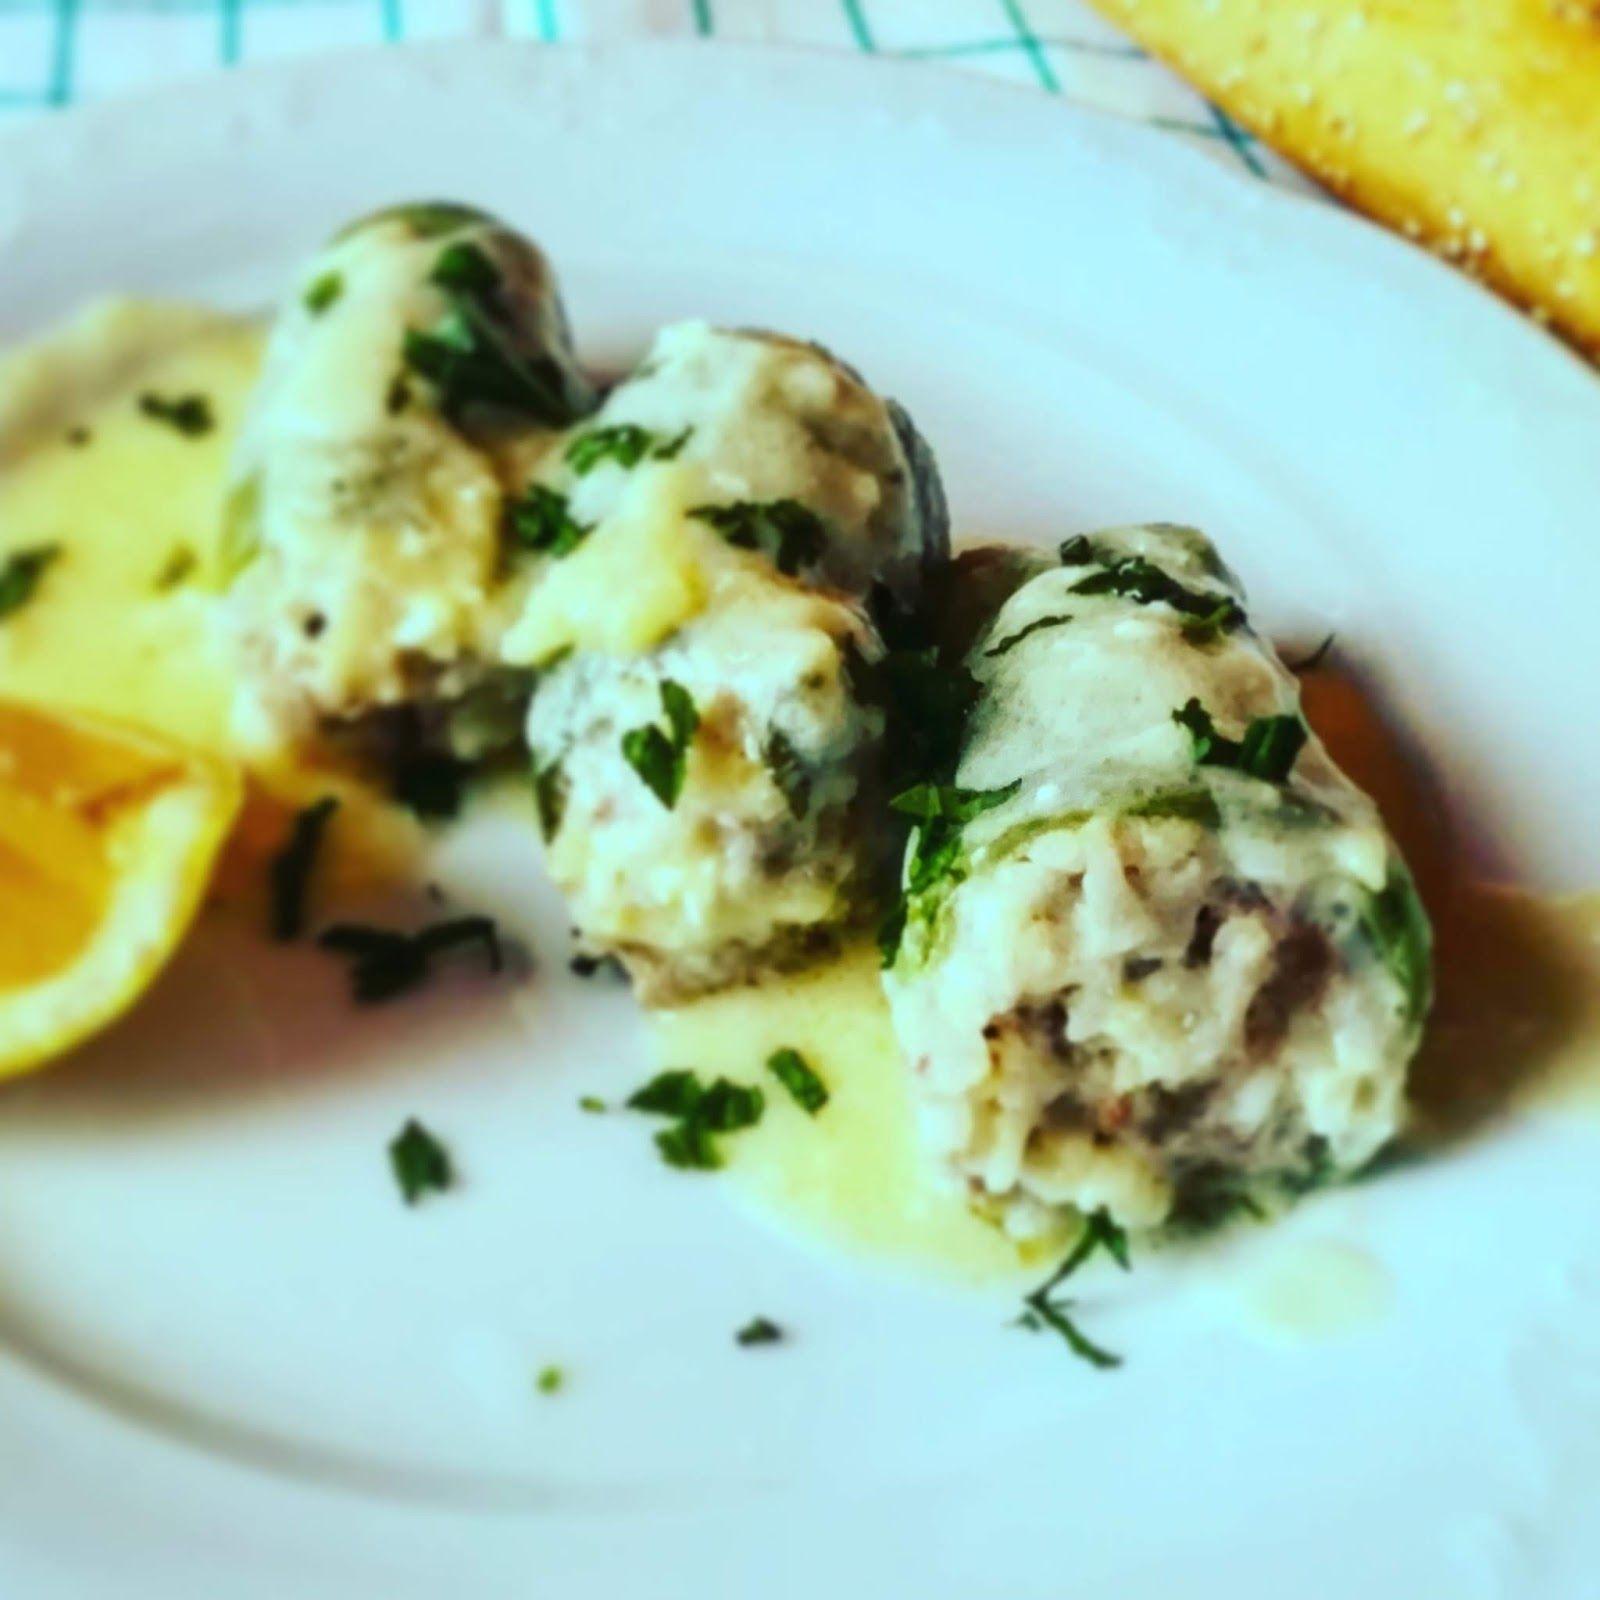 3590d33d64 Στην κουζίνα μμμμ..........μου   Κολοκυθάκια γεμιστά με σάλτσα ...